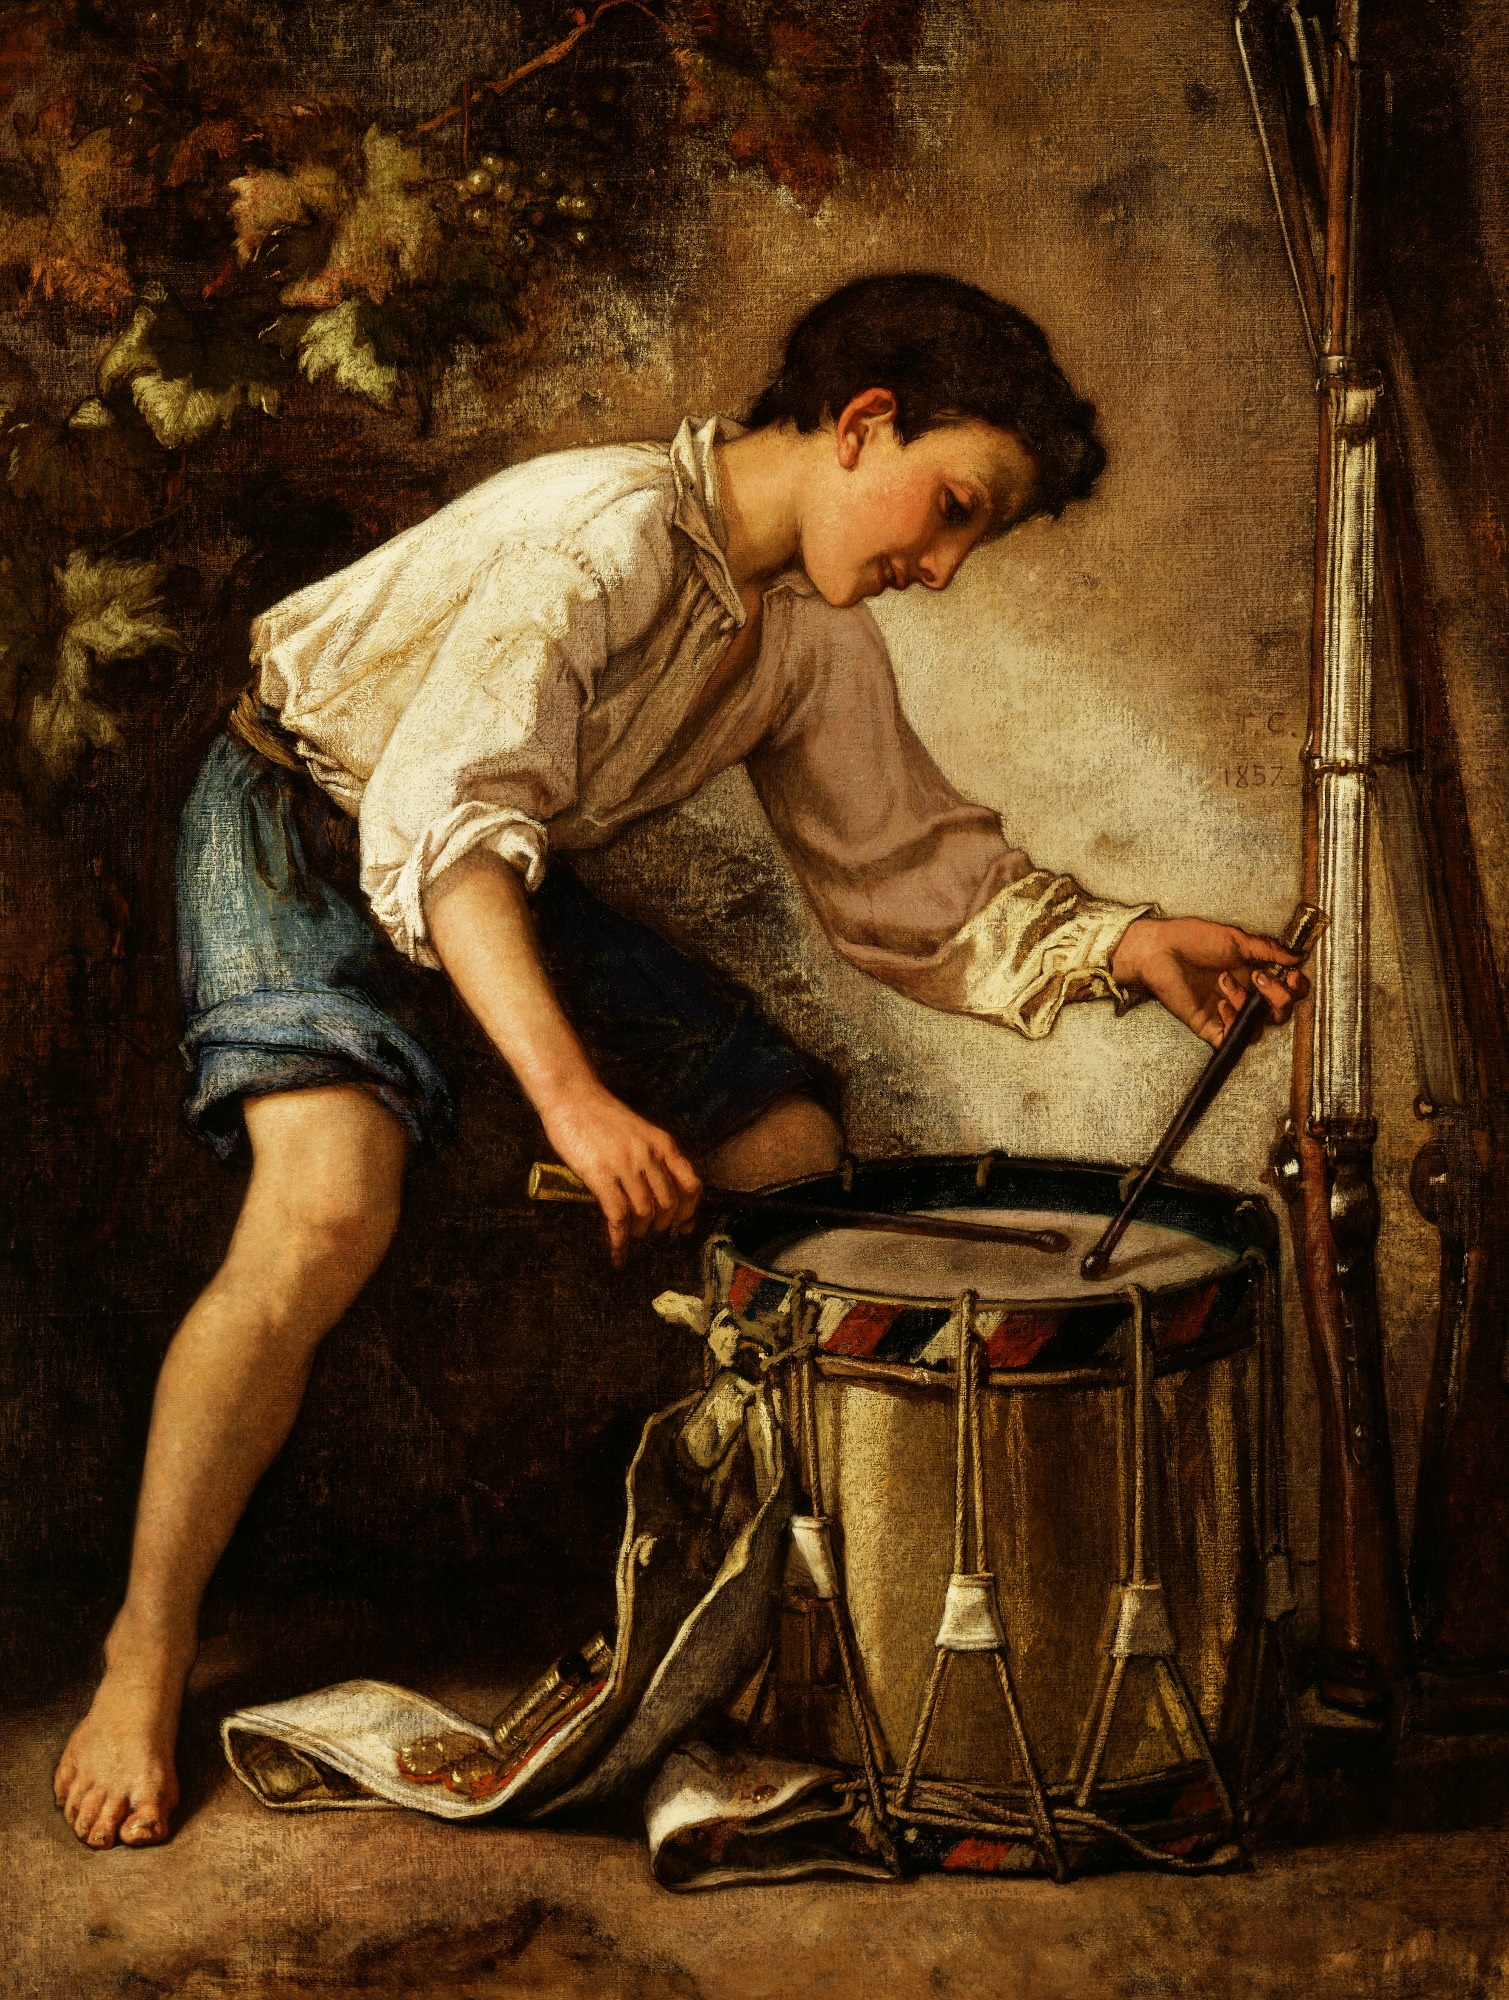 filedrummer boy 1857 thomas couturejpg wikimedia commons